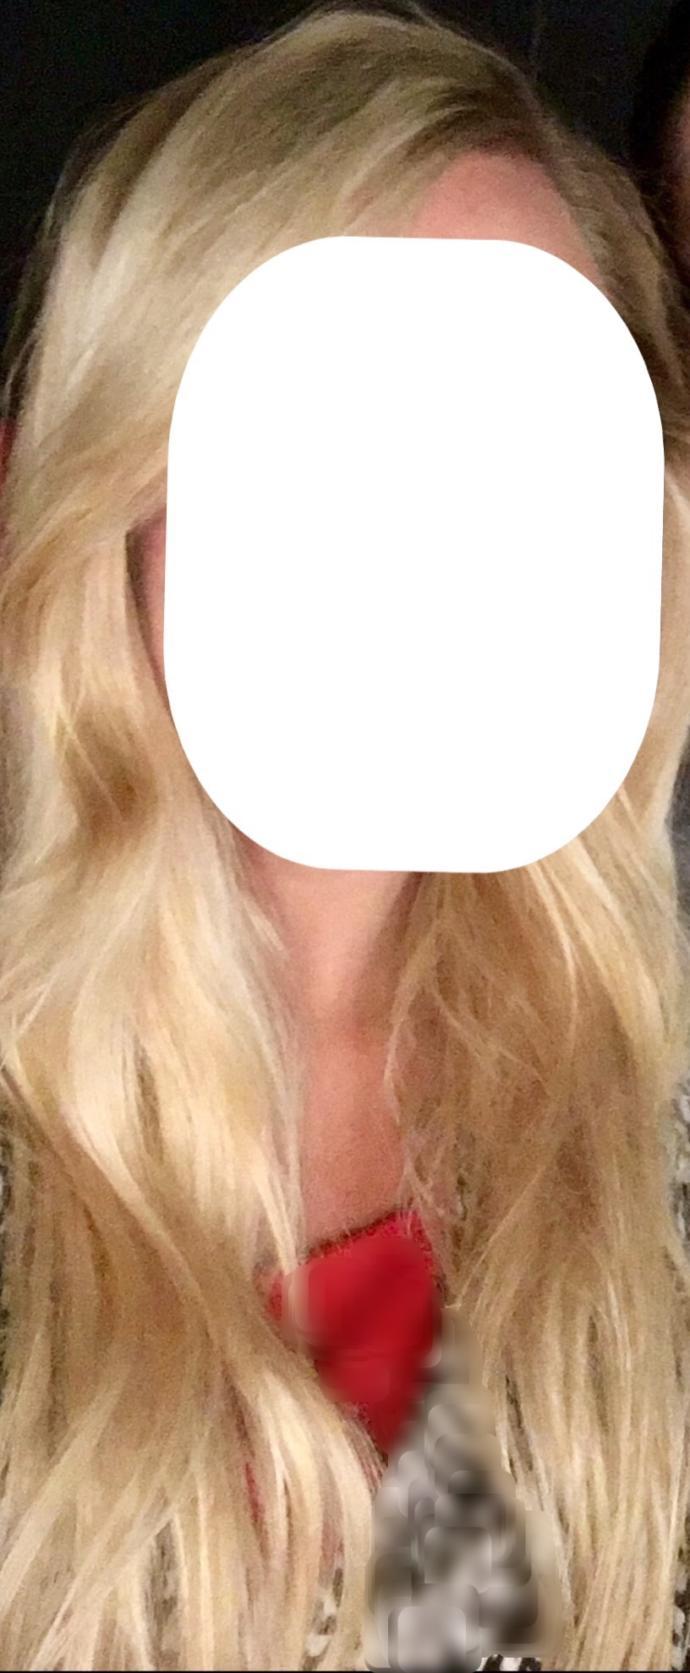 Do you like her hair?